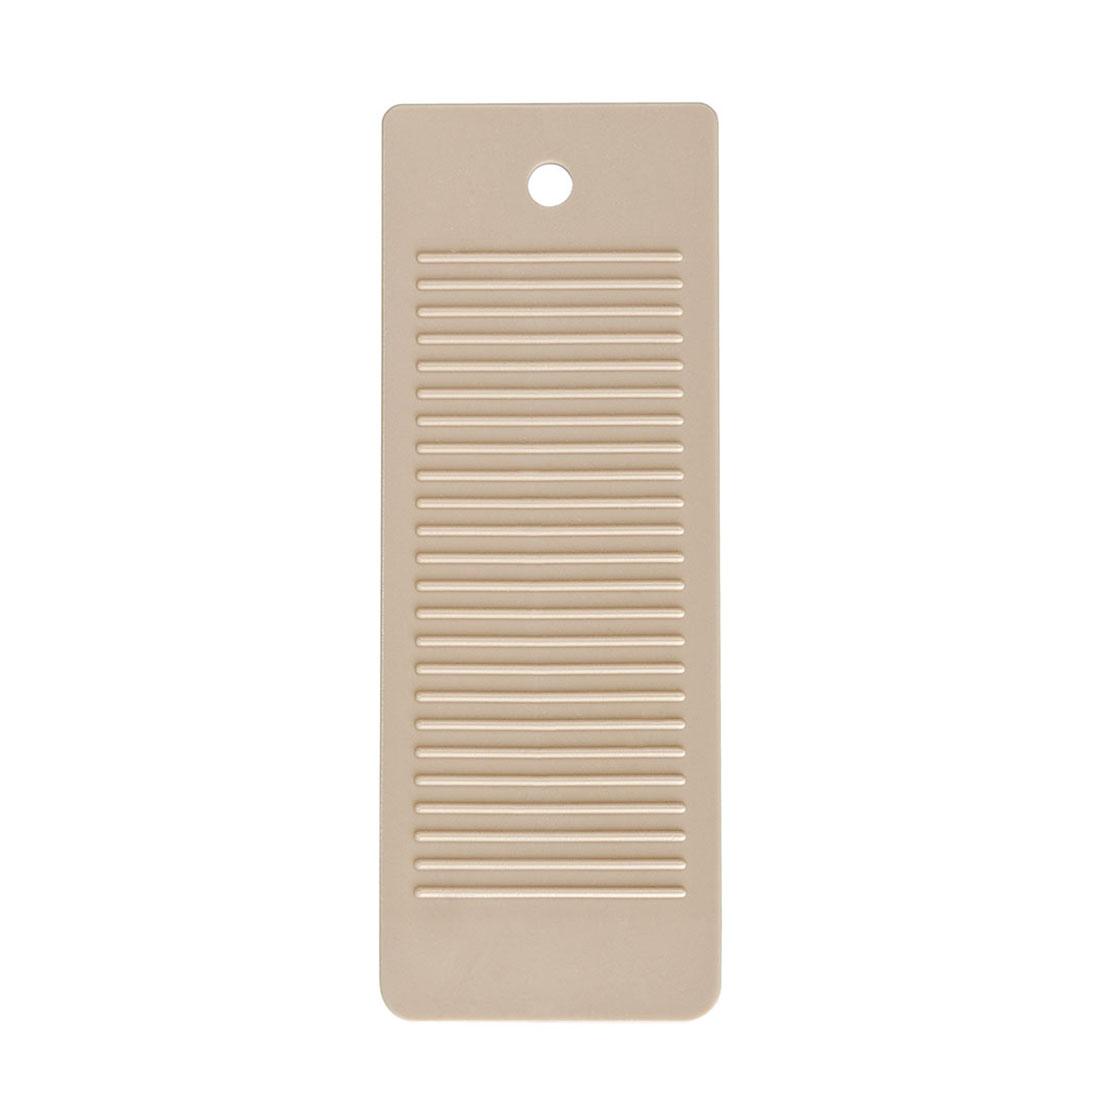 Стоппер для двери, 2 штуки [05581],